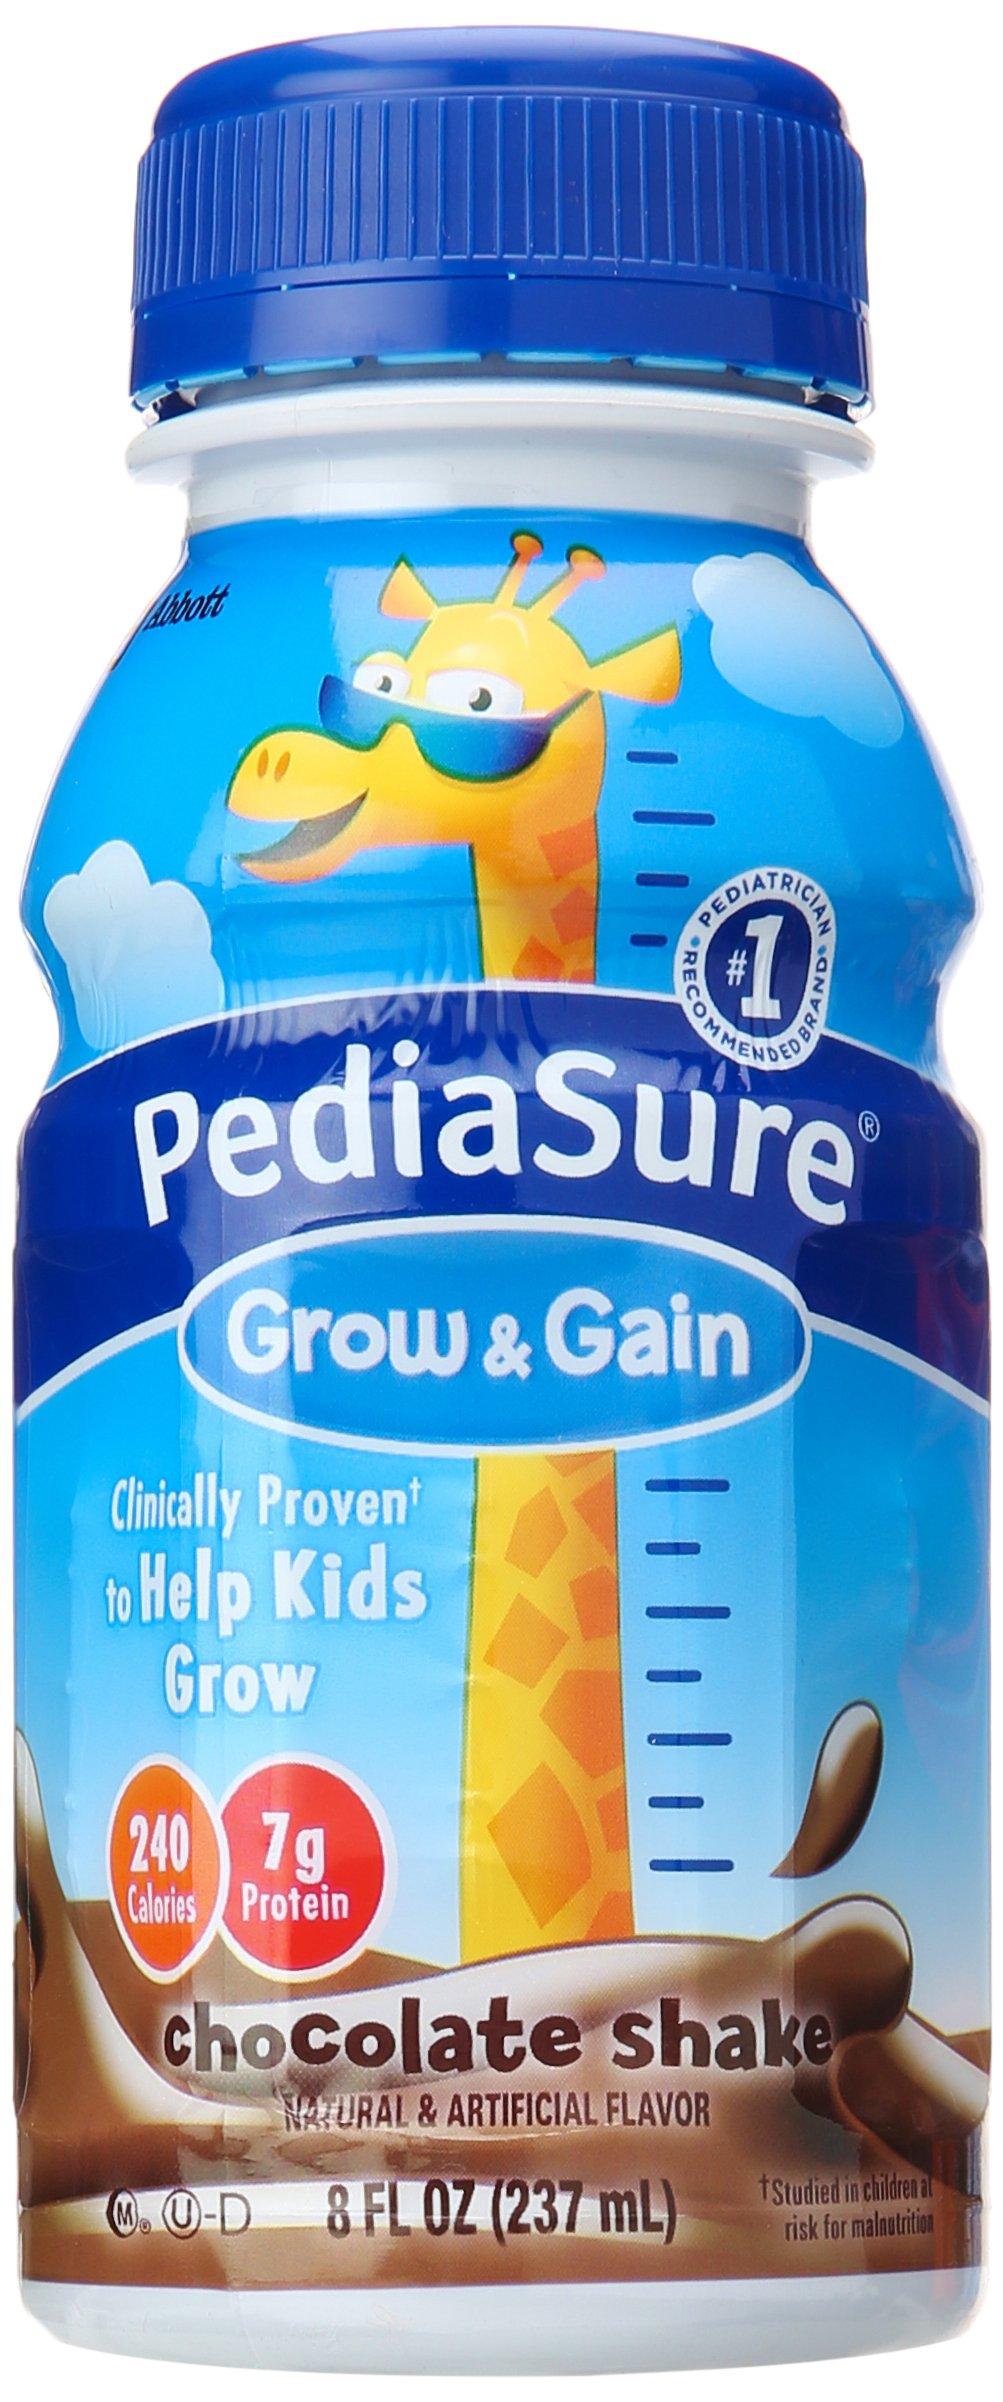 PediaSure Nutrition Shake, Chocolate, 8 Fl oz (Pack of 6) by Pediasure